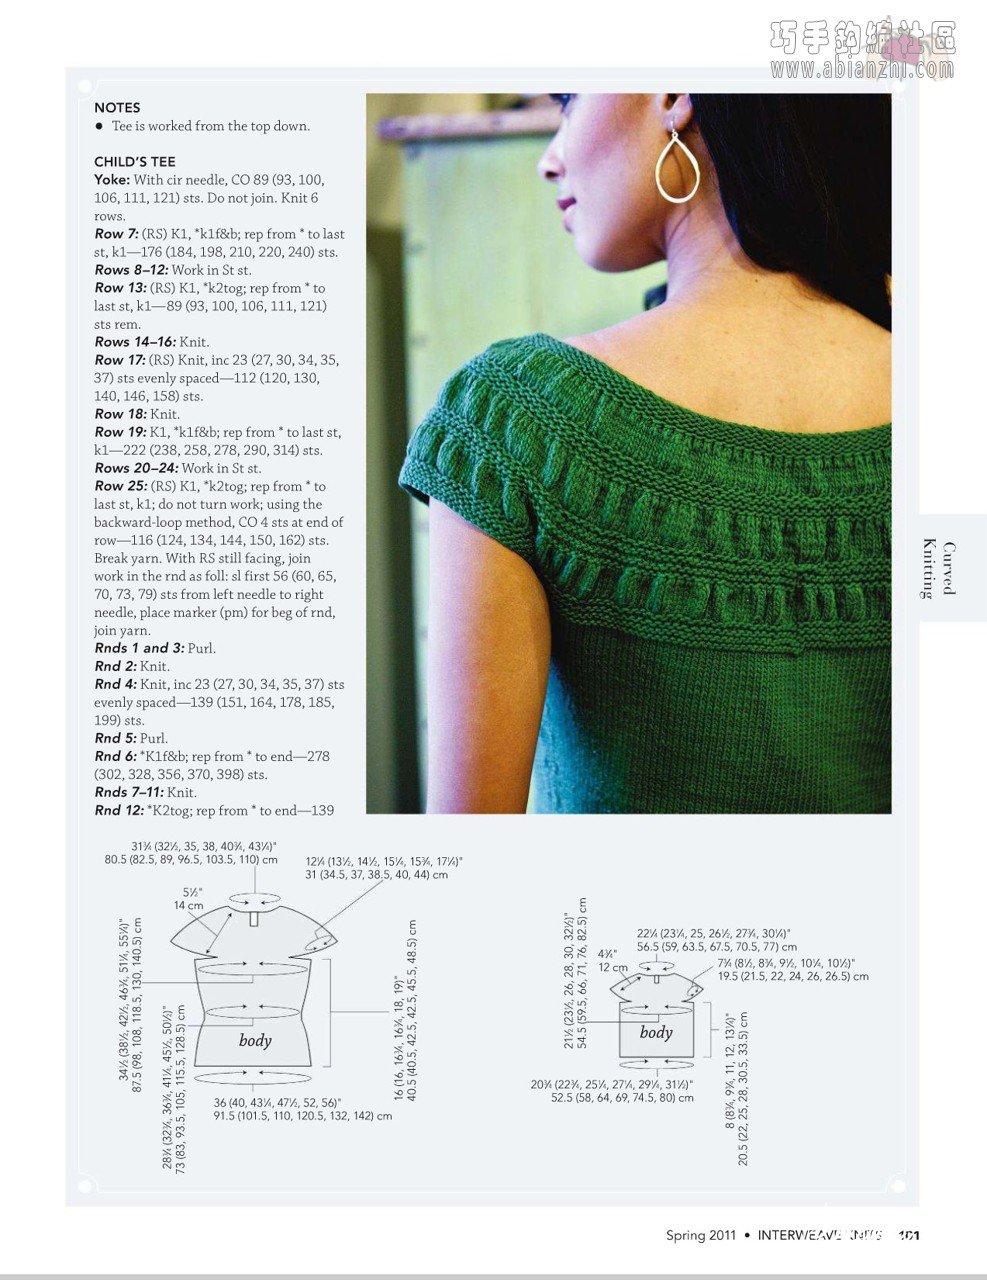 IWKSp11_page103_image1.jpg